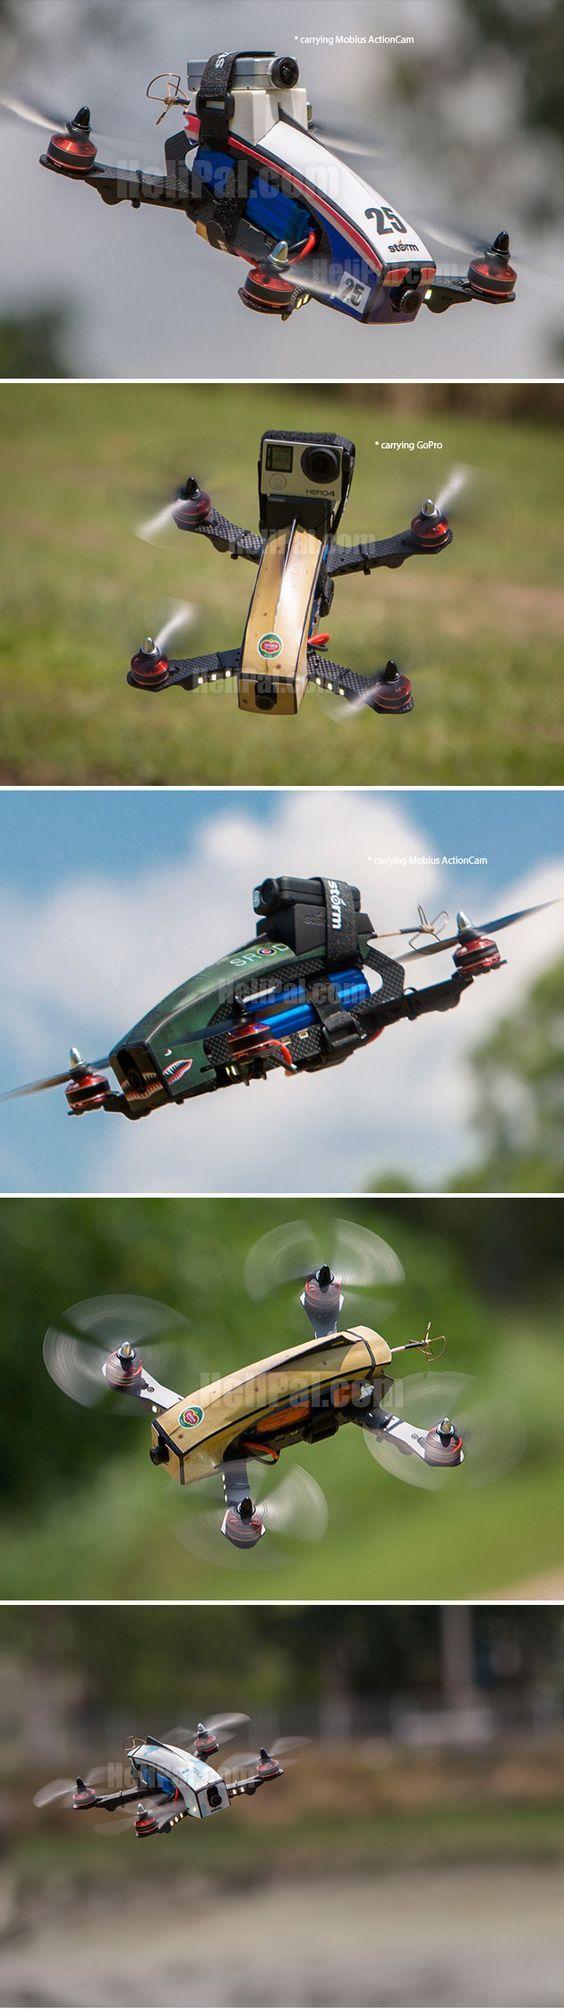 STORM Racing Drone (RTF / Kylin 250 Storm Edition) www.helipal.com/...: